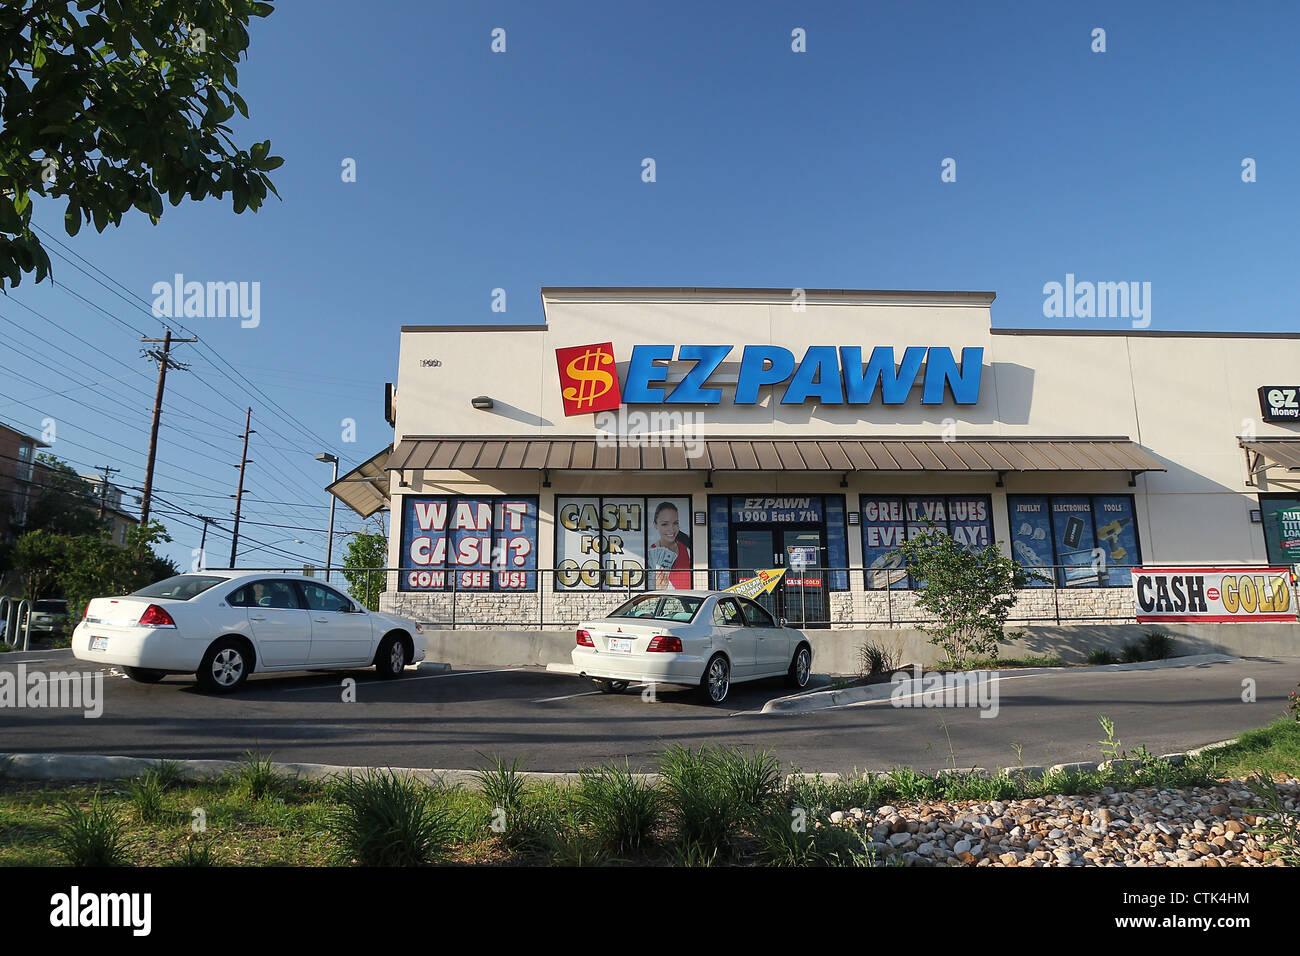 Pawn Shop Austin >> A Pawn Shop In Austin Texas Stock Photo 49593200 Alamy